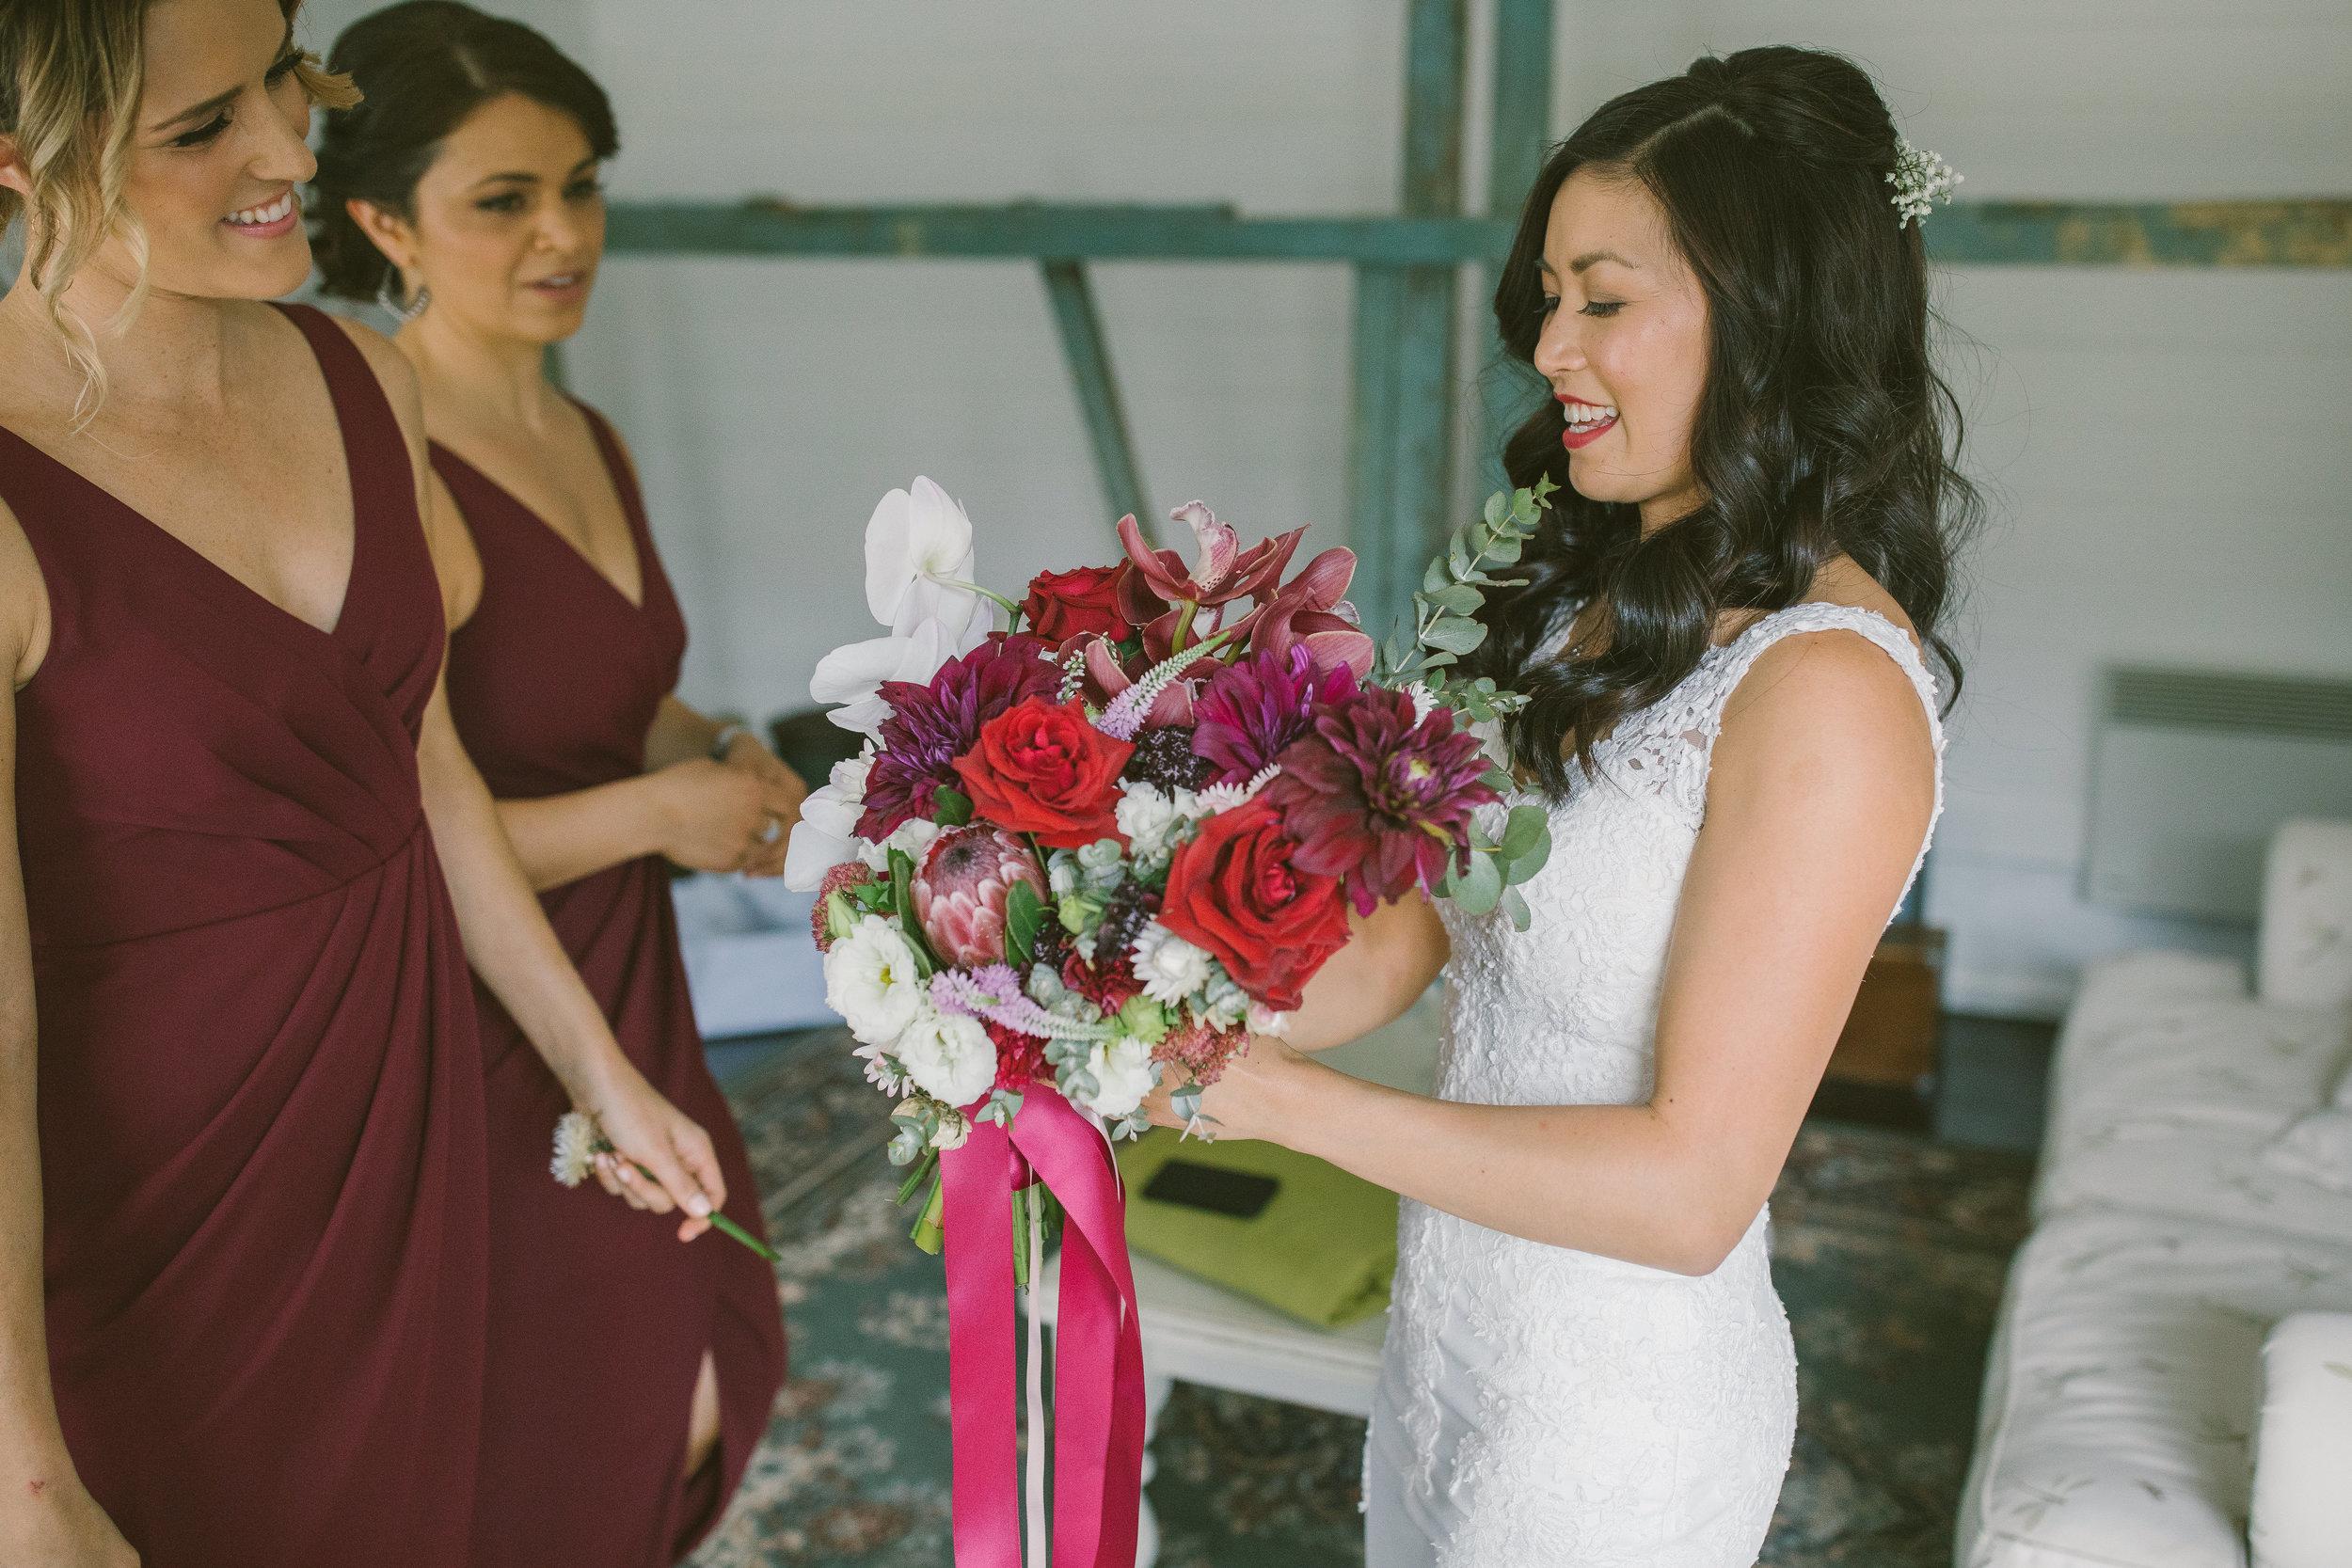 Sarah + Jason - Mali Brae Farm Wedding Photographer - Magnus Agren Photography-0168.jpg